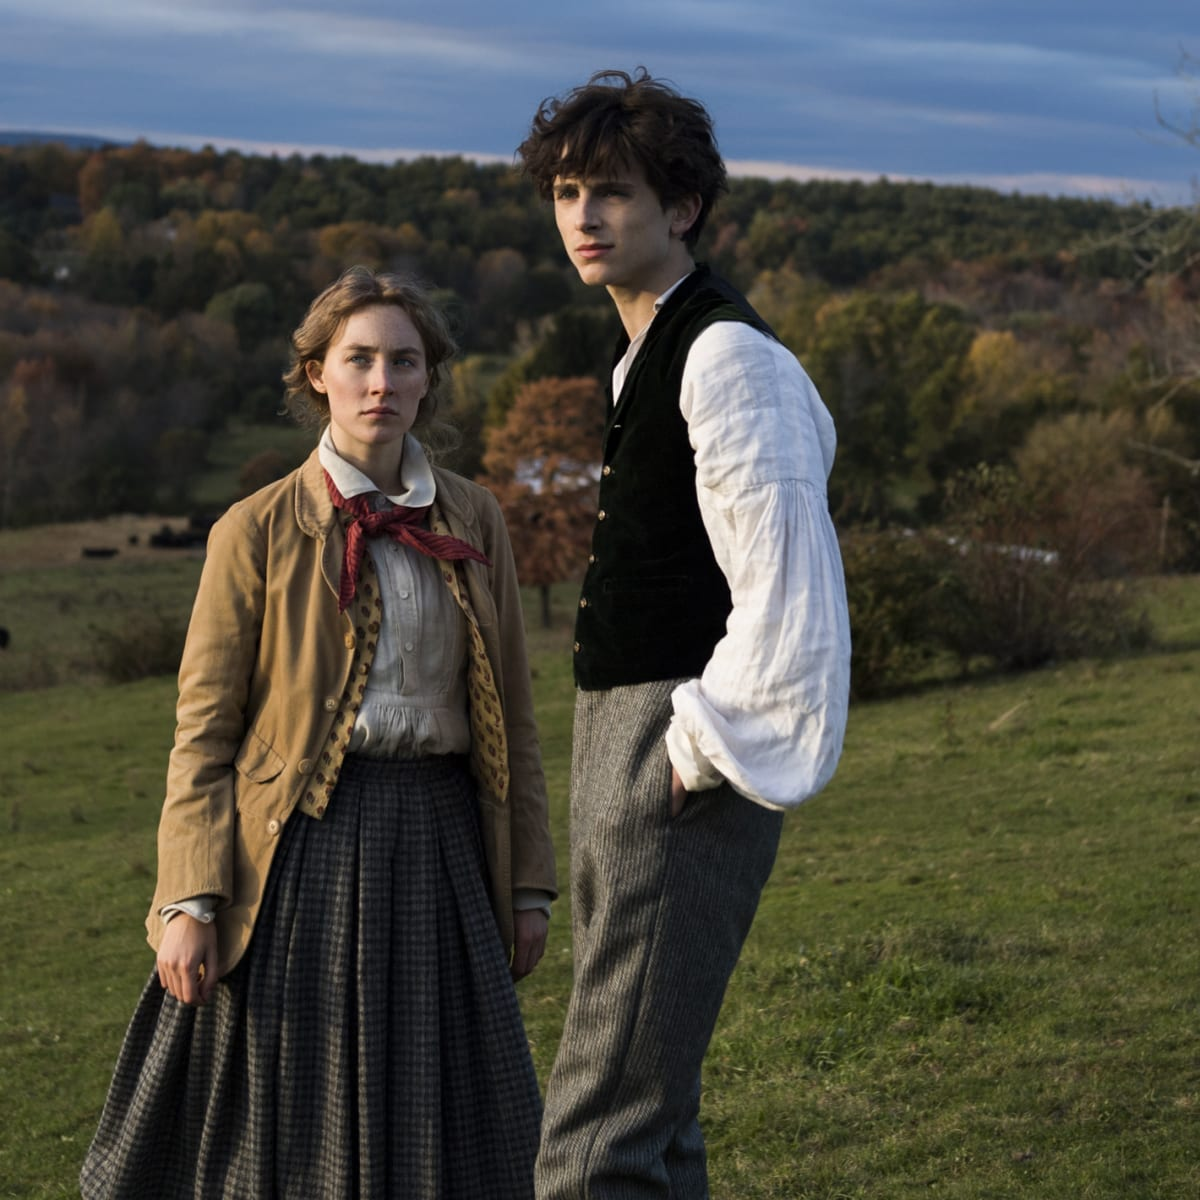 Saoirse Ronan and Timothée Chalamet 'Swap' Civil War-Era Costumes in 'Little  Women' - Fashionista